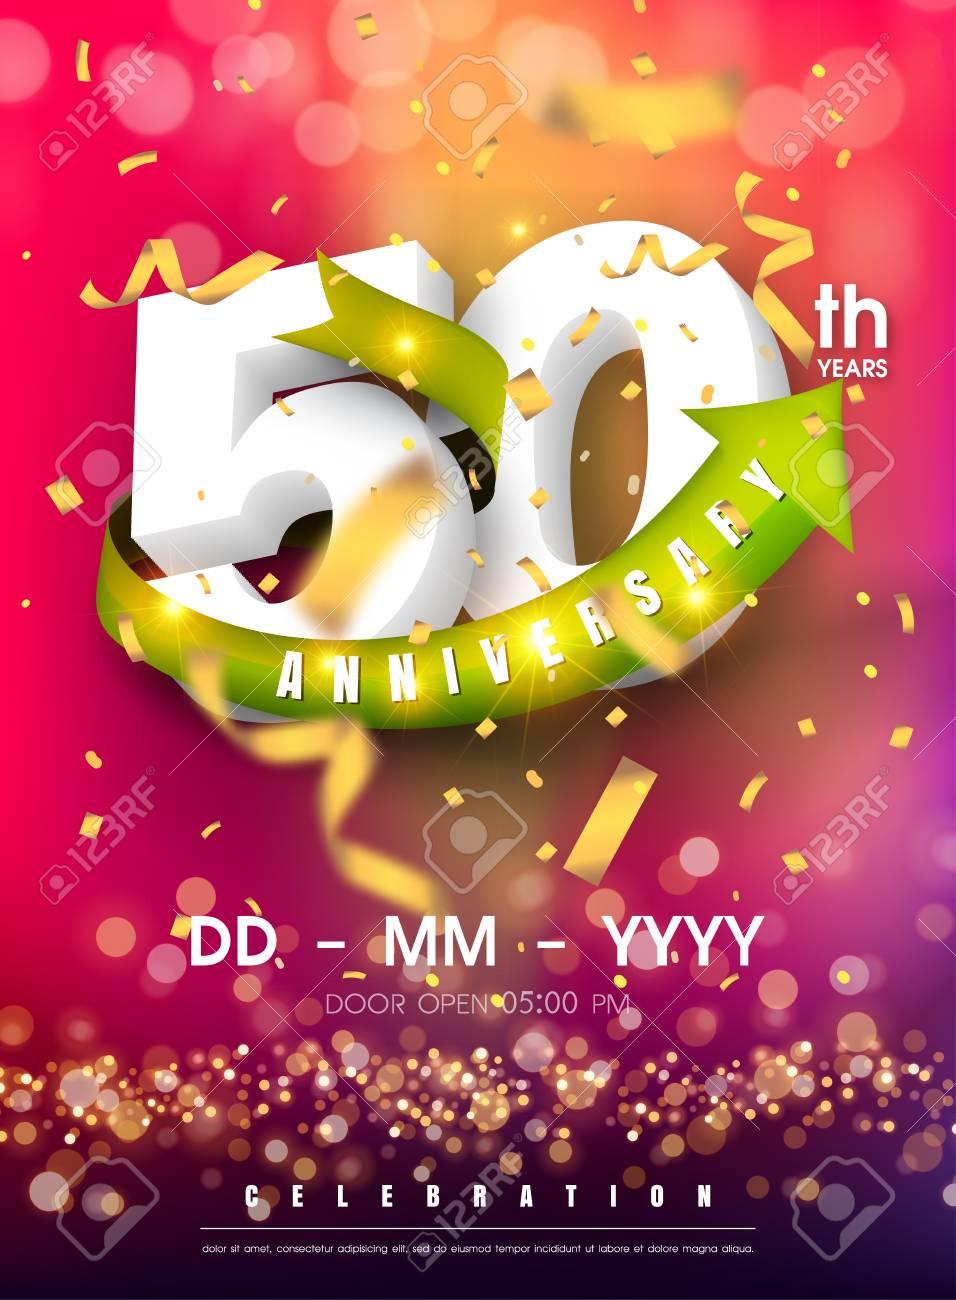 50 Years Anniversary Invitation Card Celebration Templatedesign